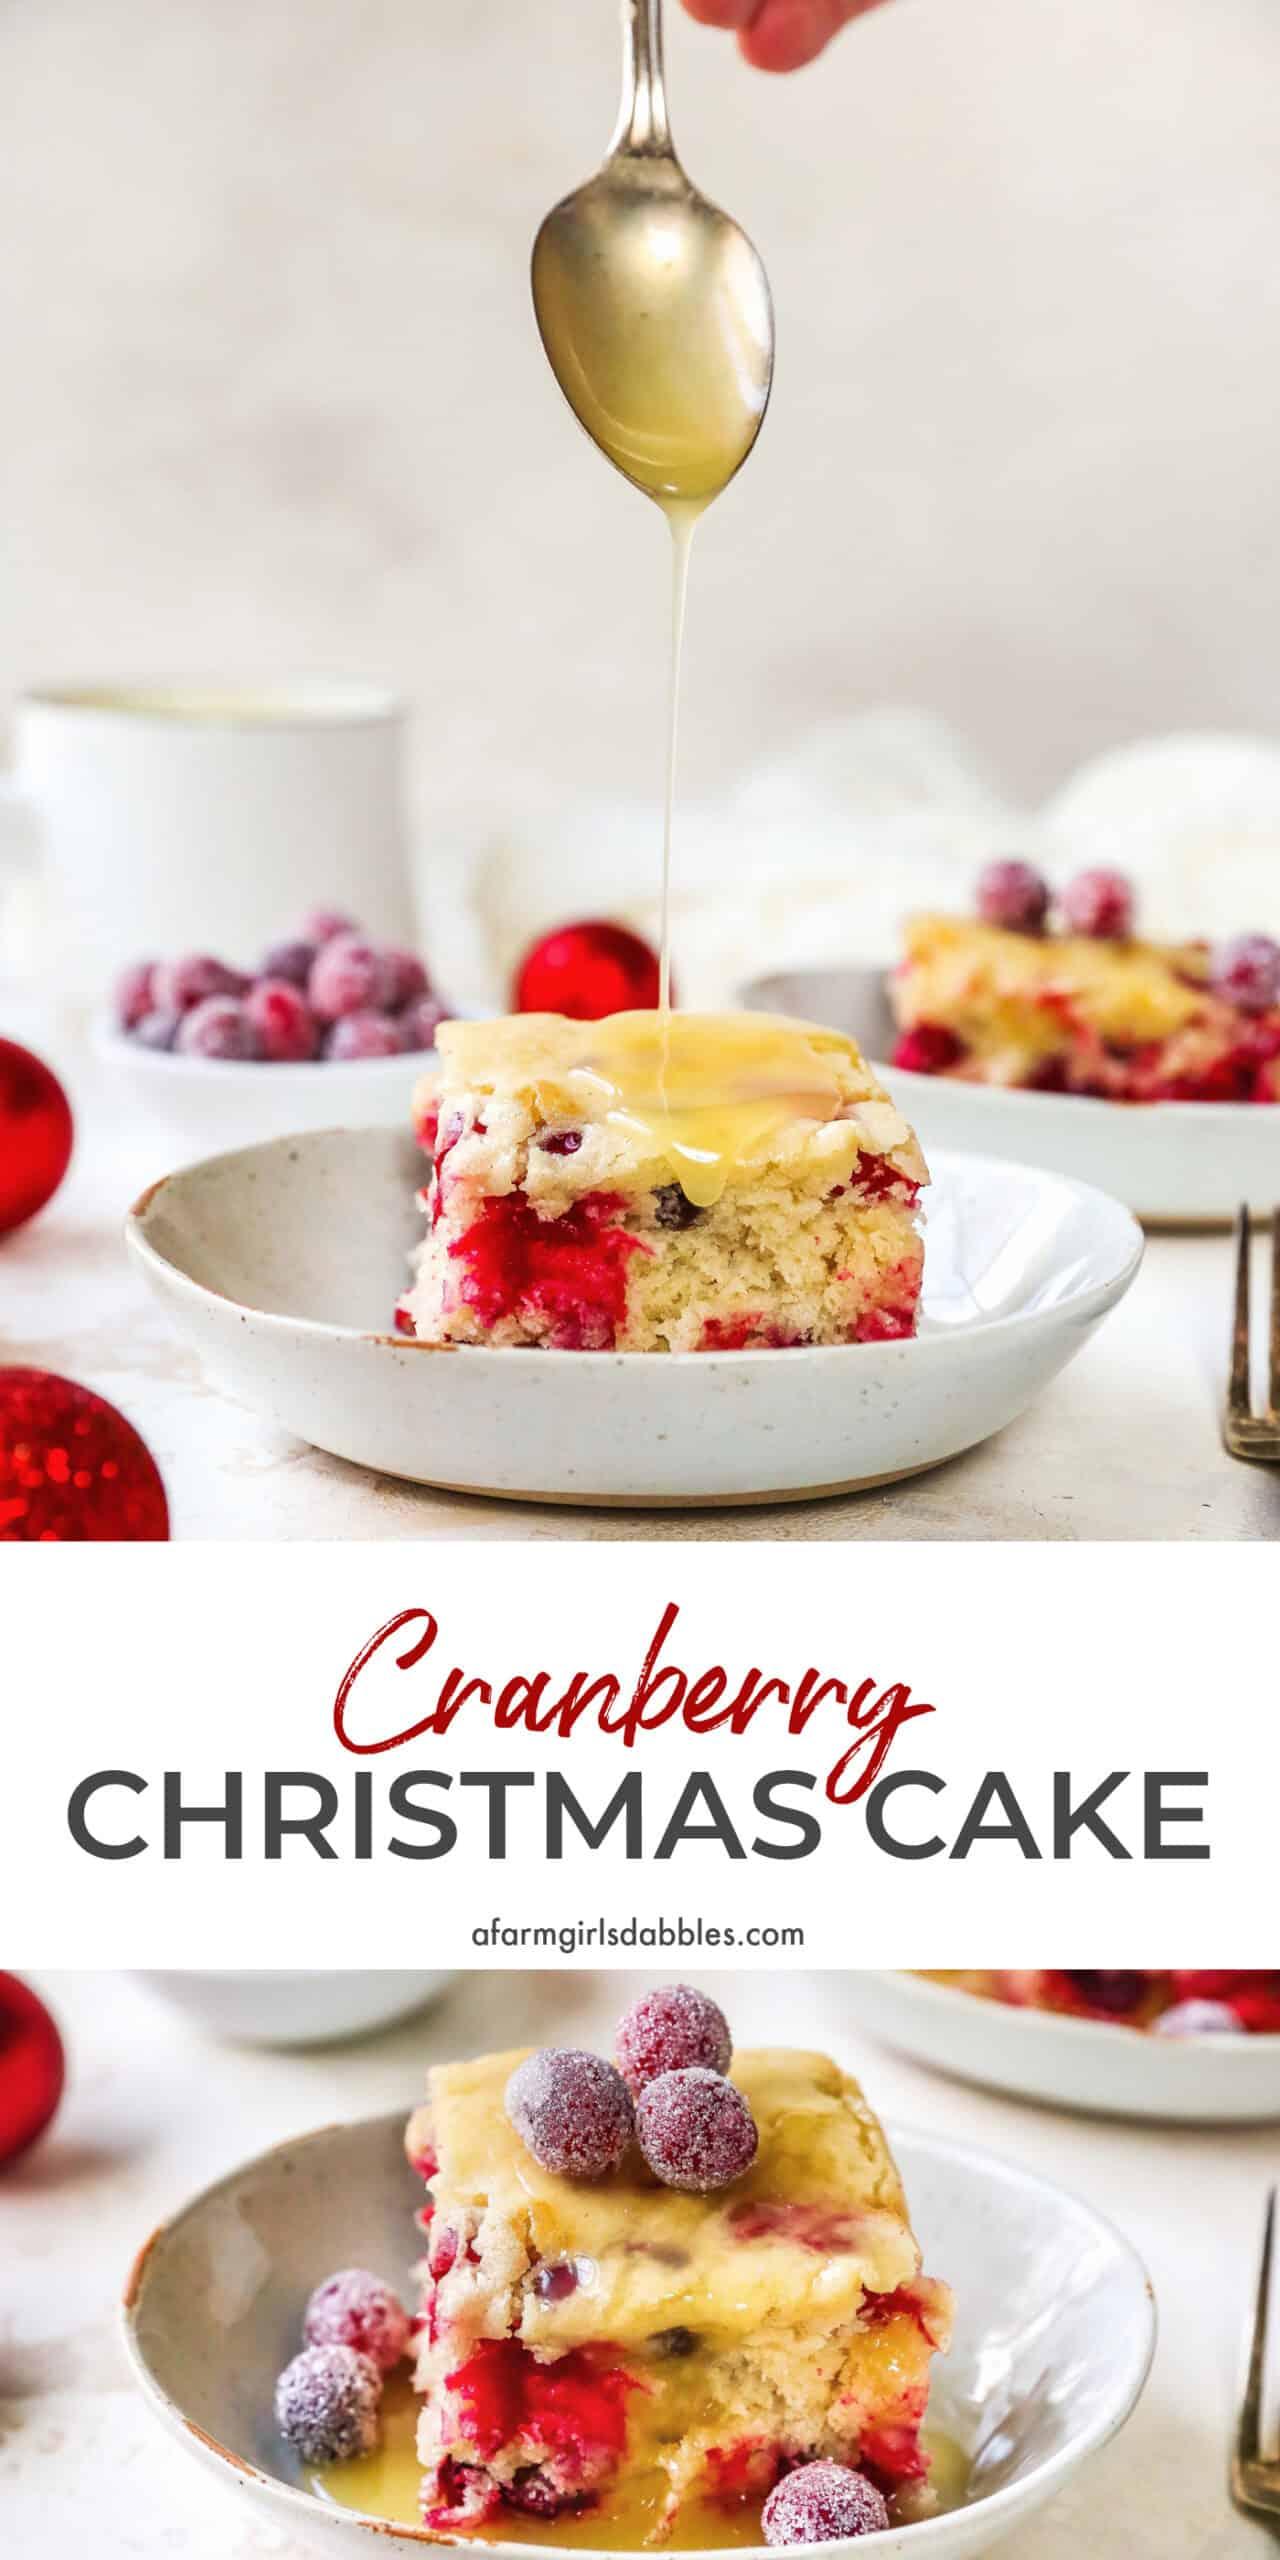 Pinterest image of cranberry Christmas cake